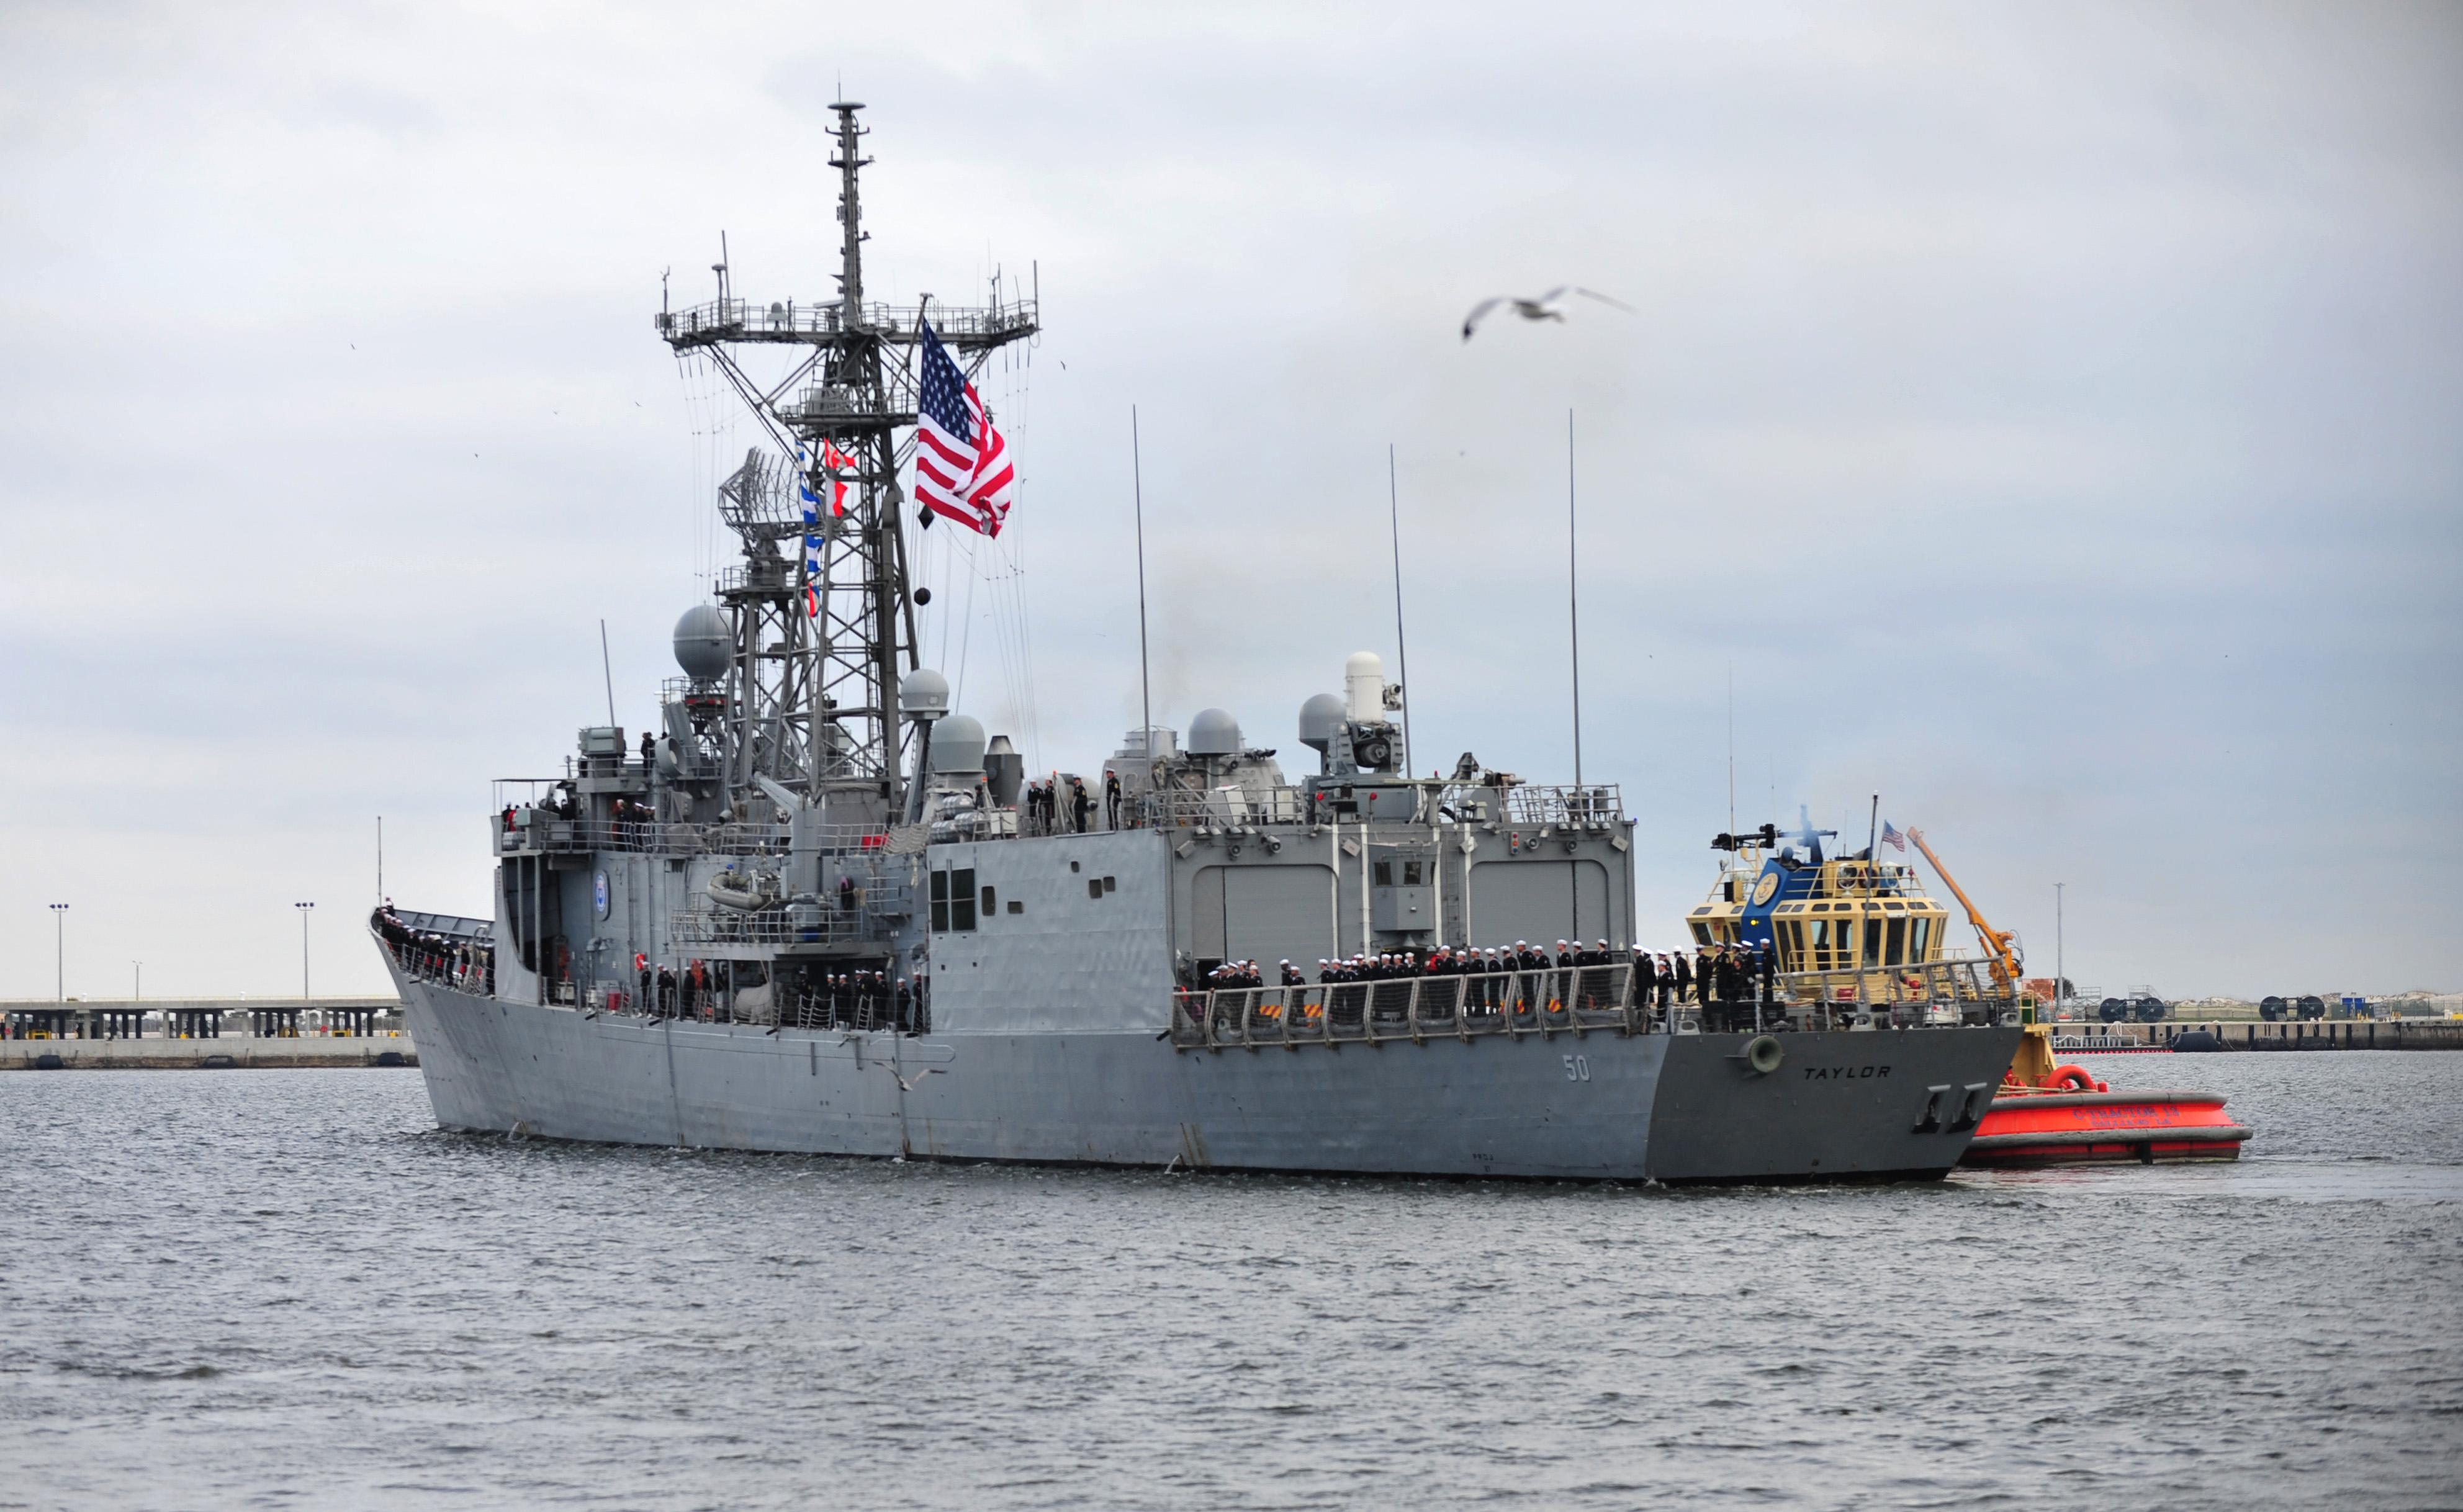 USS TAYLOR FFG-50 Auslaufen Mayport am 08.01.2014 Bild: U.S. Navy